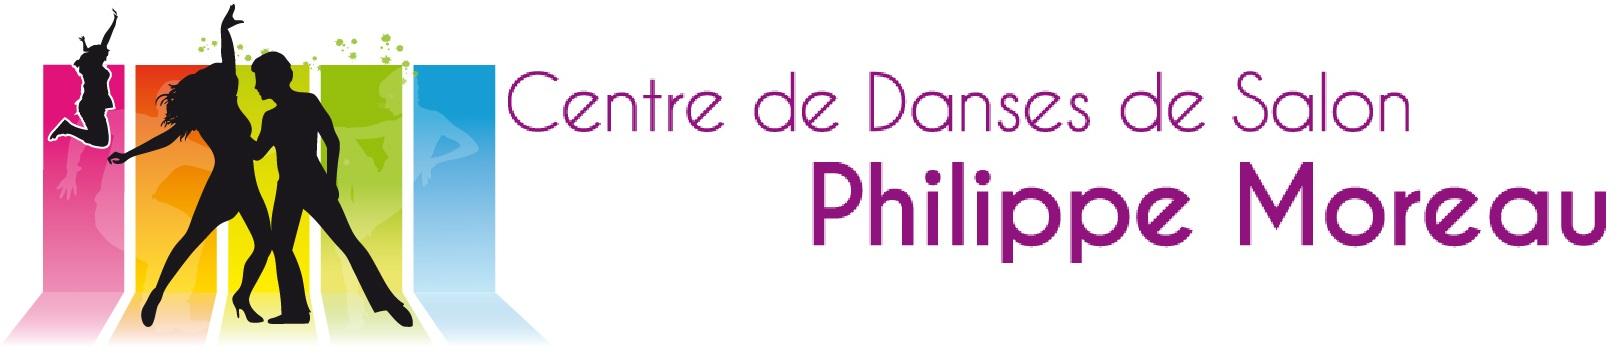 Ecole de danse Philippe Moreau